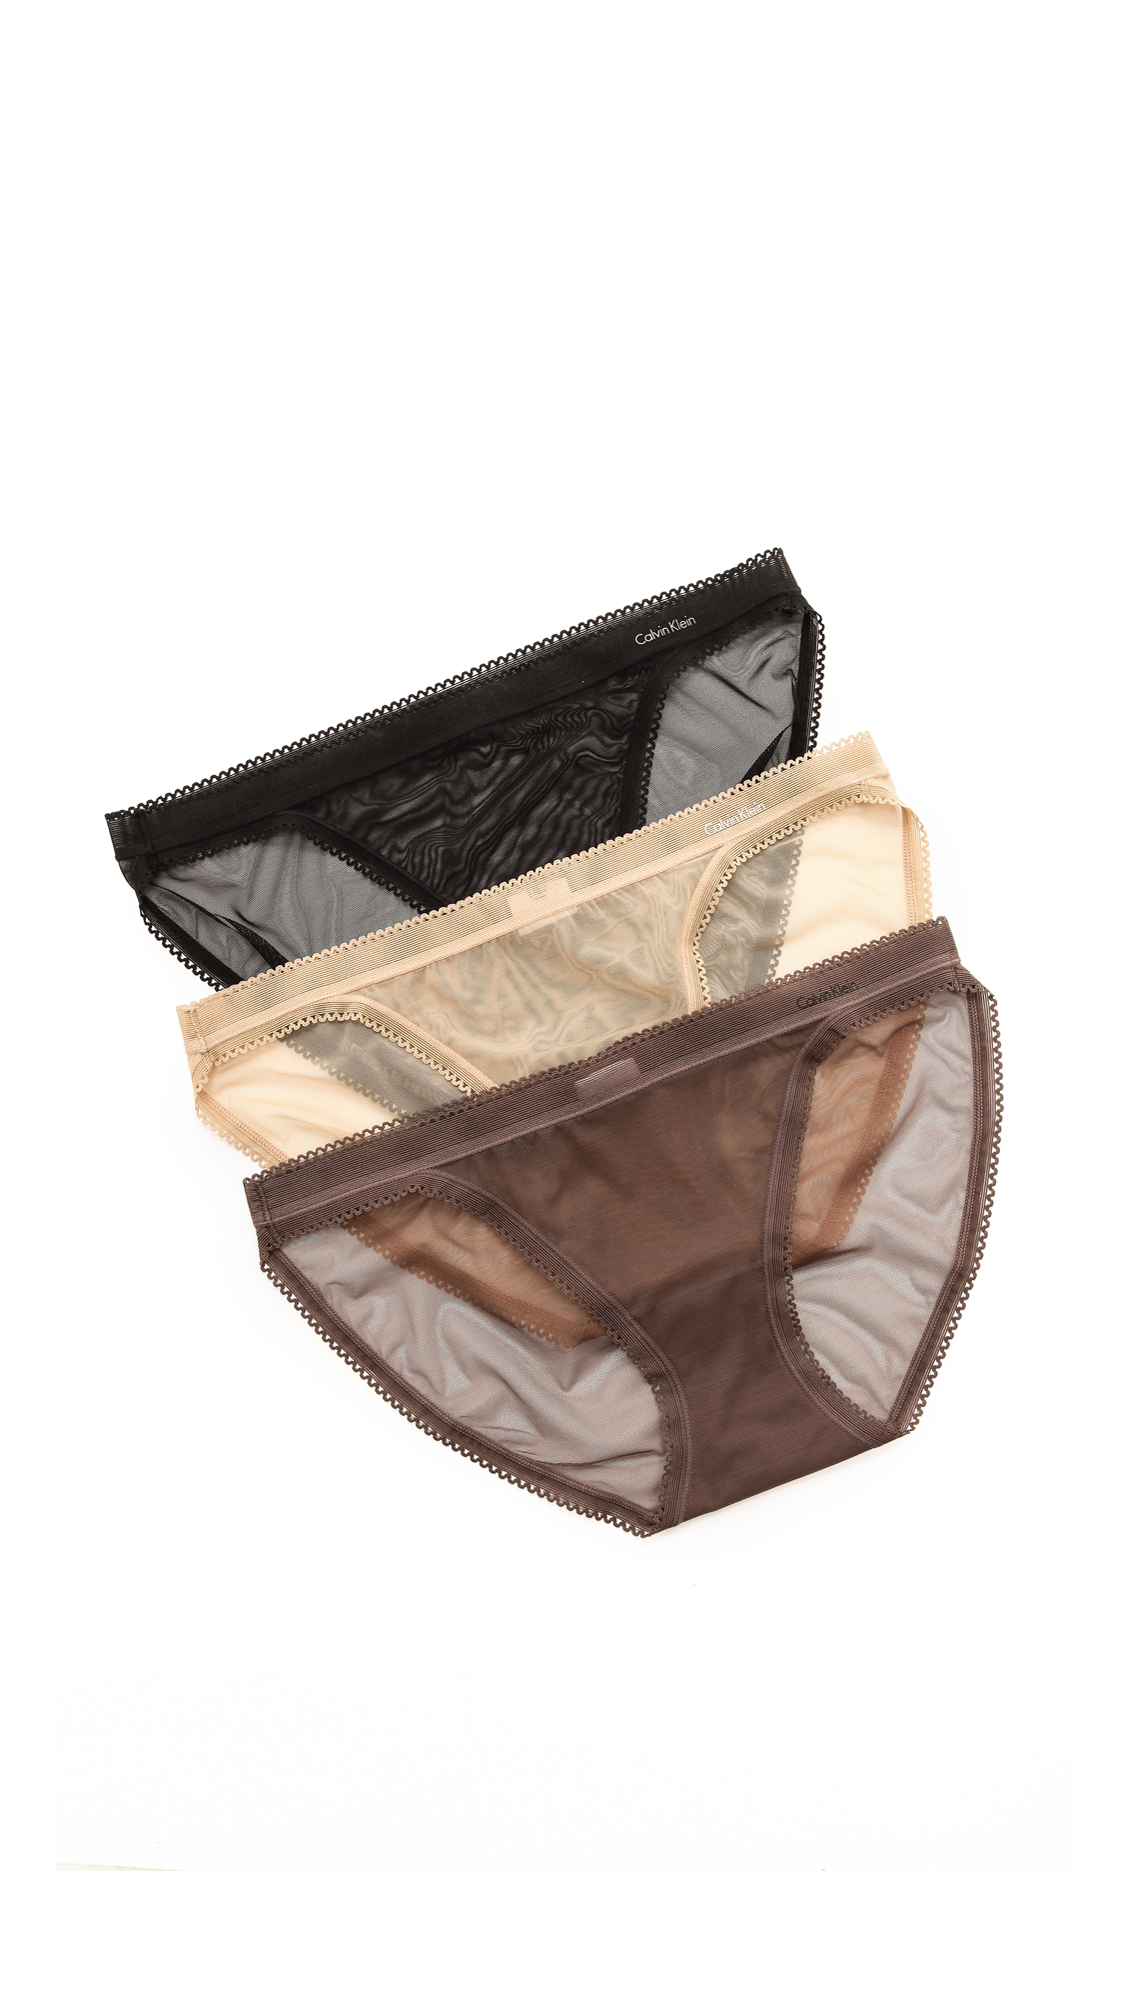 calvin klein icon string bikini 3 pack multi in. Black Bedroom Furniture Sets. Home Design Ideas